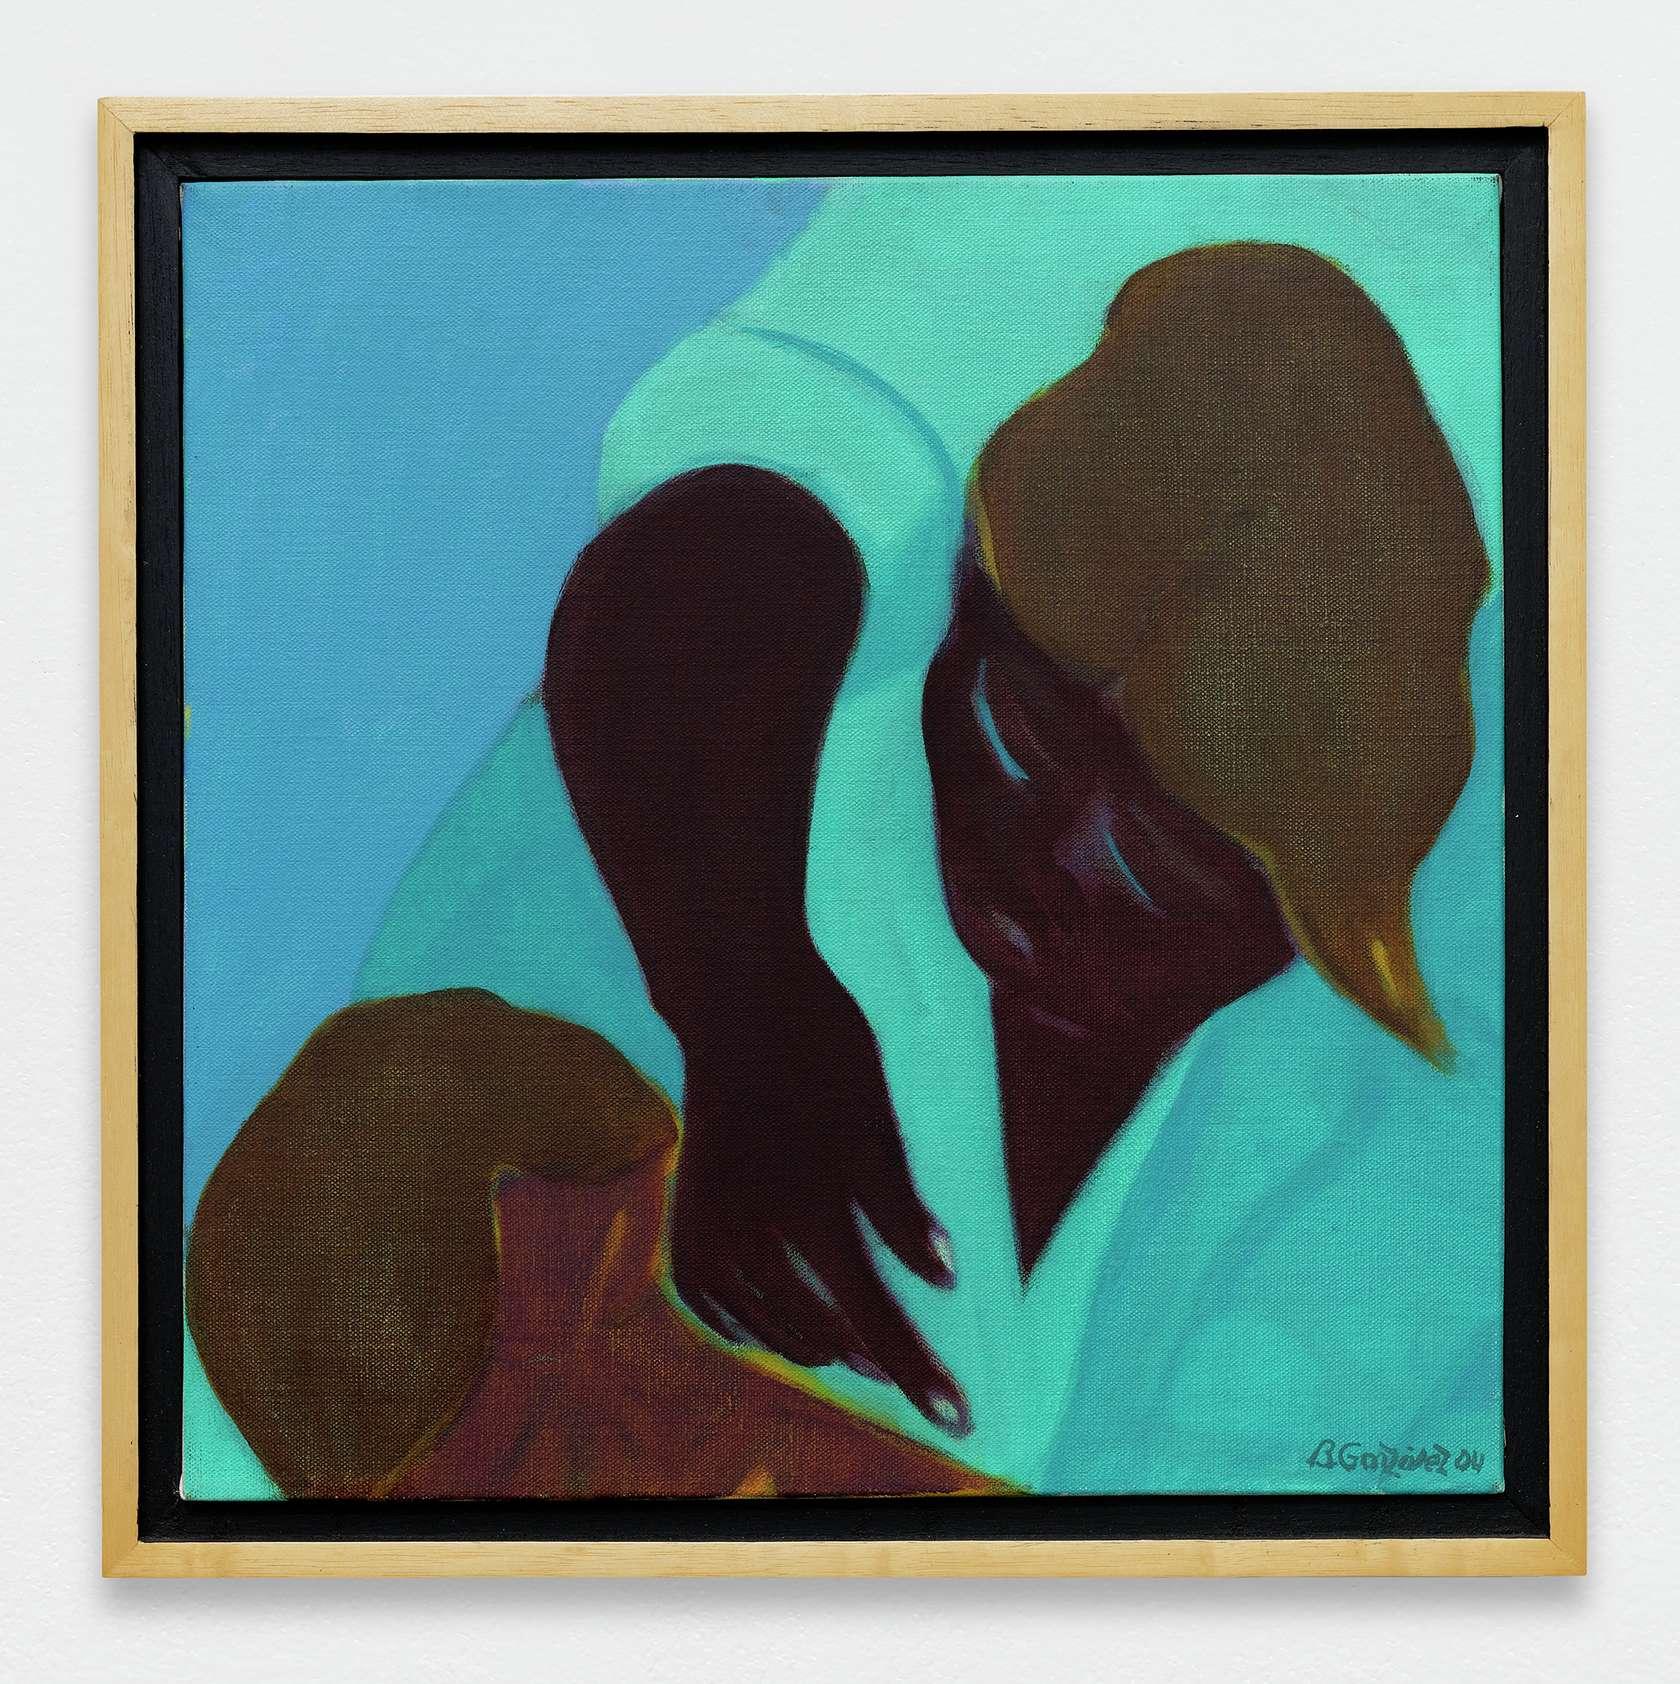 Beatriz González, Tercera Piedad, 2005 Huile sur toile45 × 45 cm / 17 6/8 × 17 6/8 in.